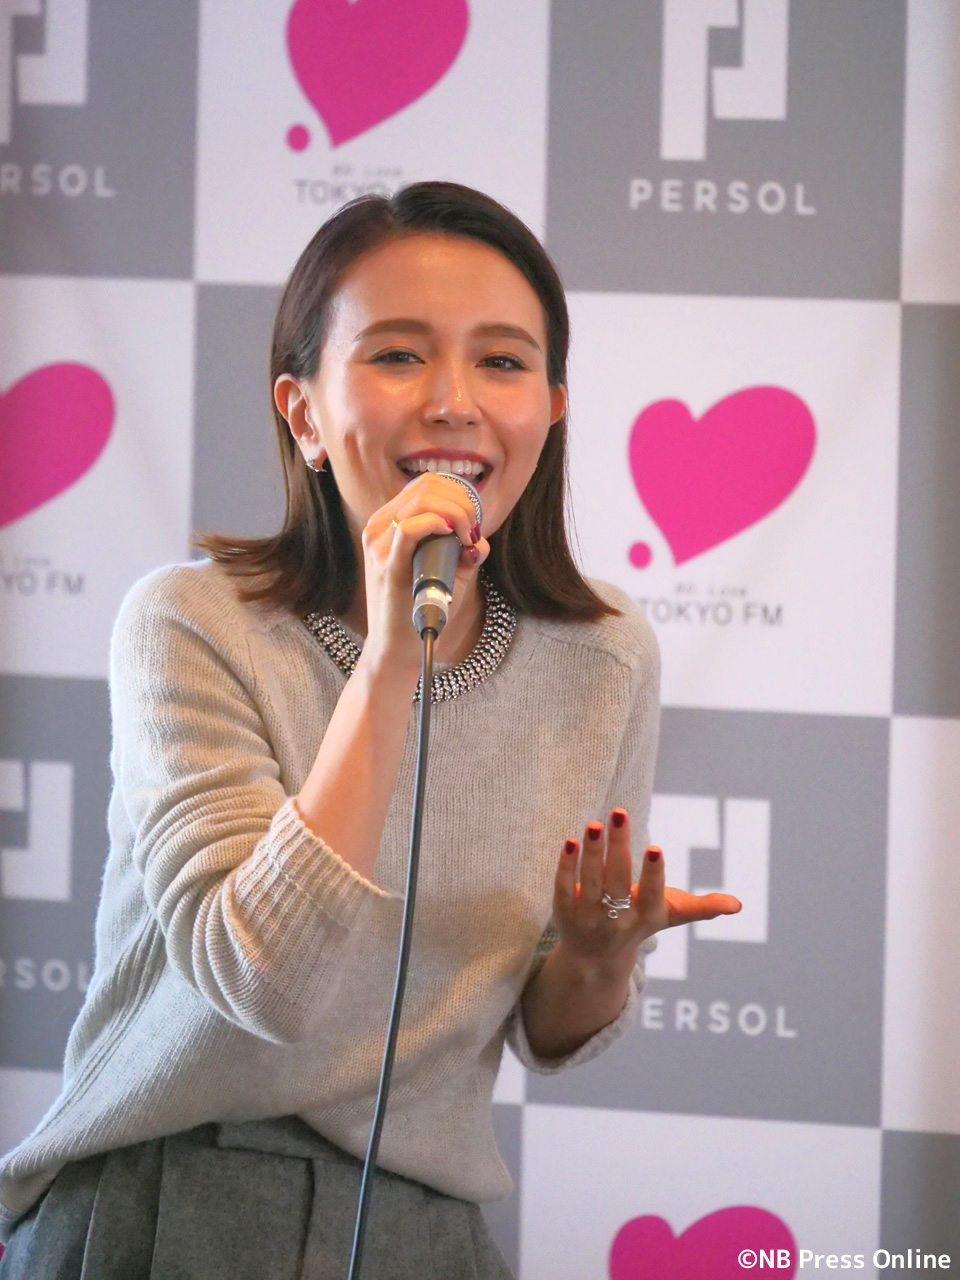 May J. - パーソル presents 勤労感謝Fes!